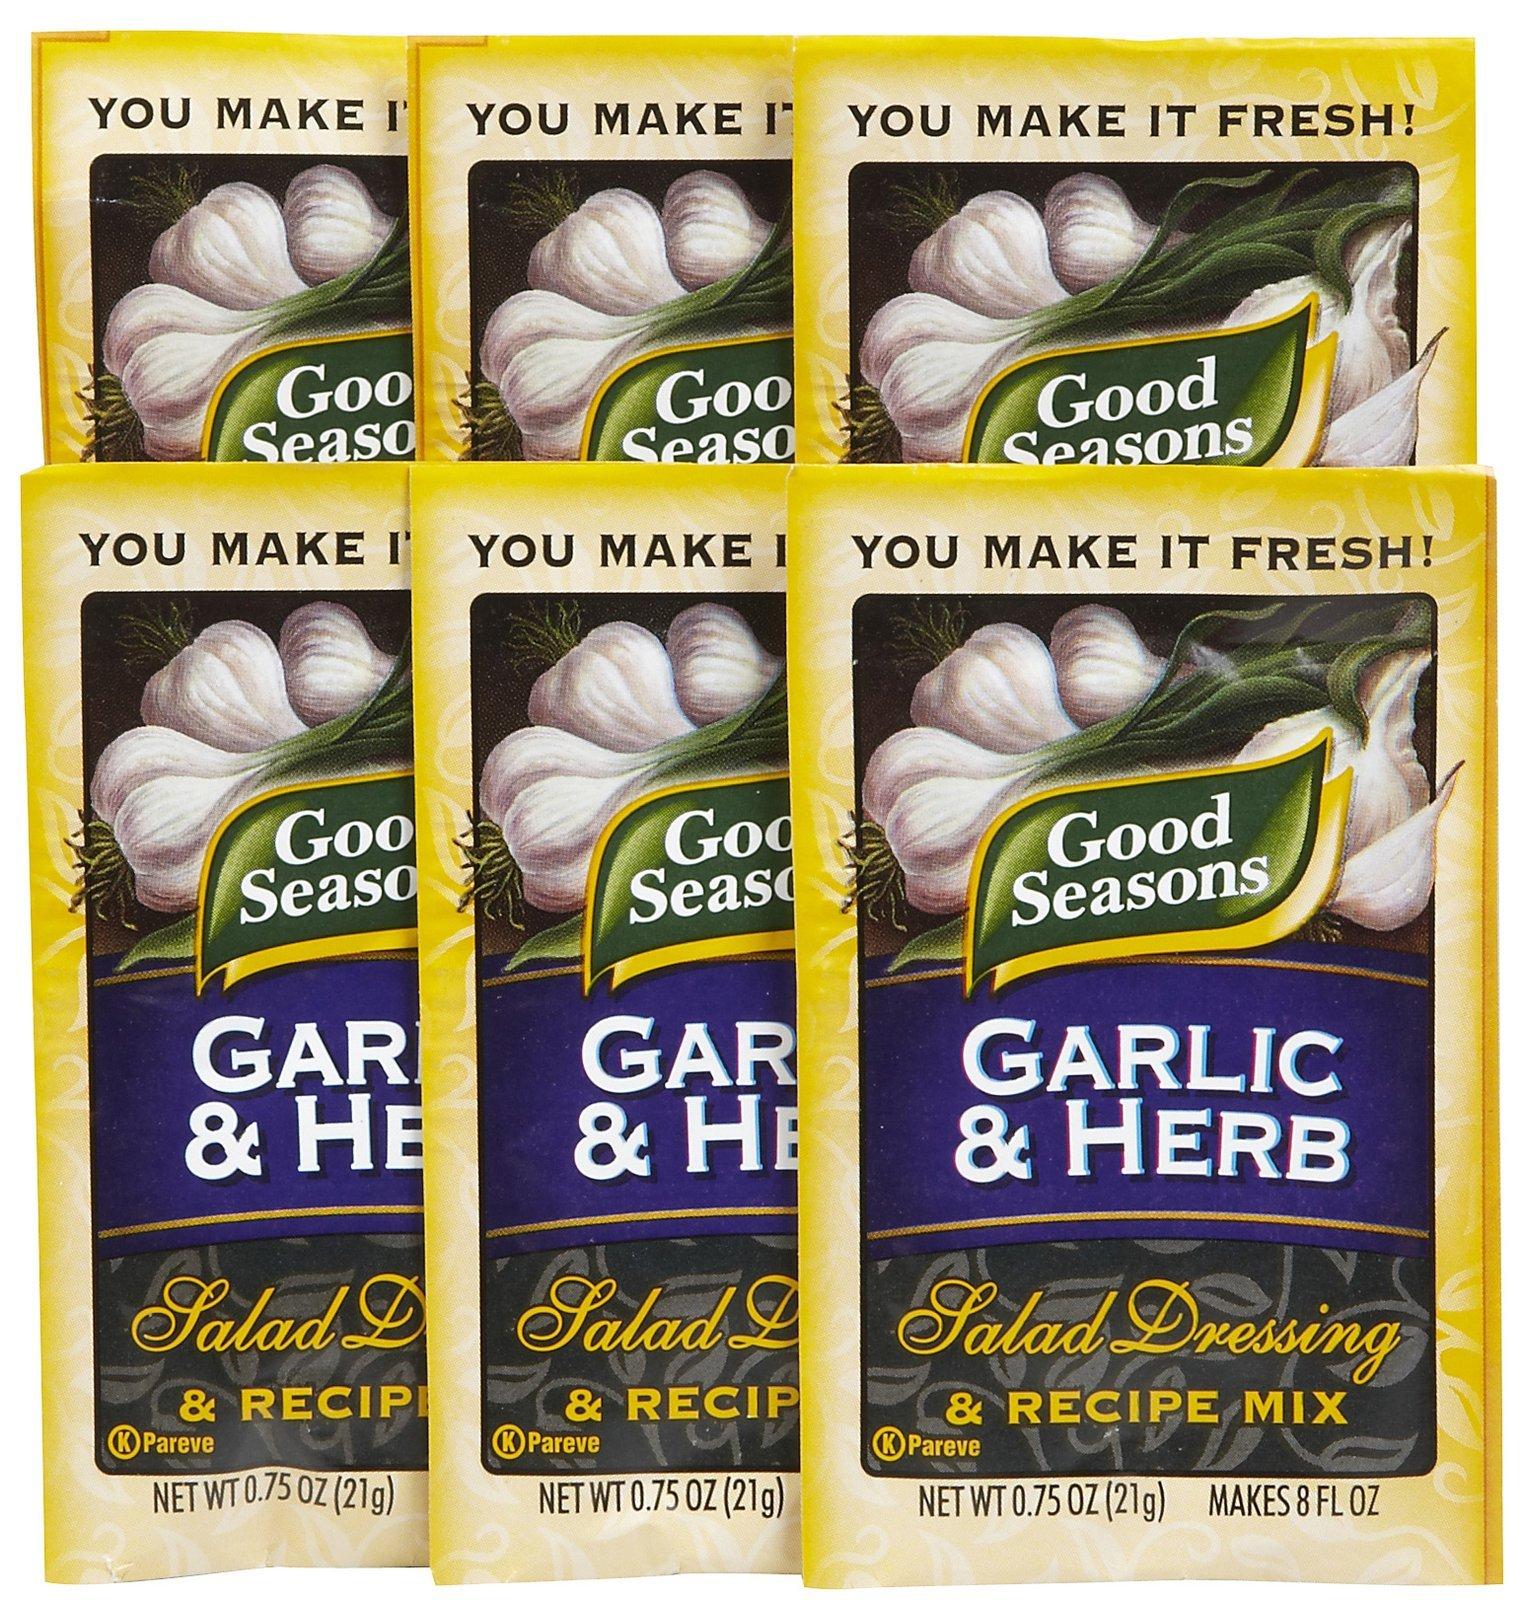 Good Seasons Salad Dressing & Recipe Mix, Garlic & Herb, 0.75 oz, 6 pk